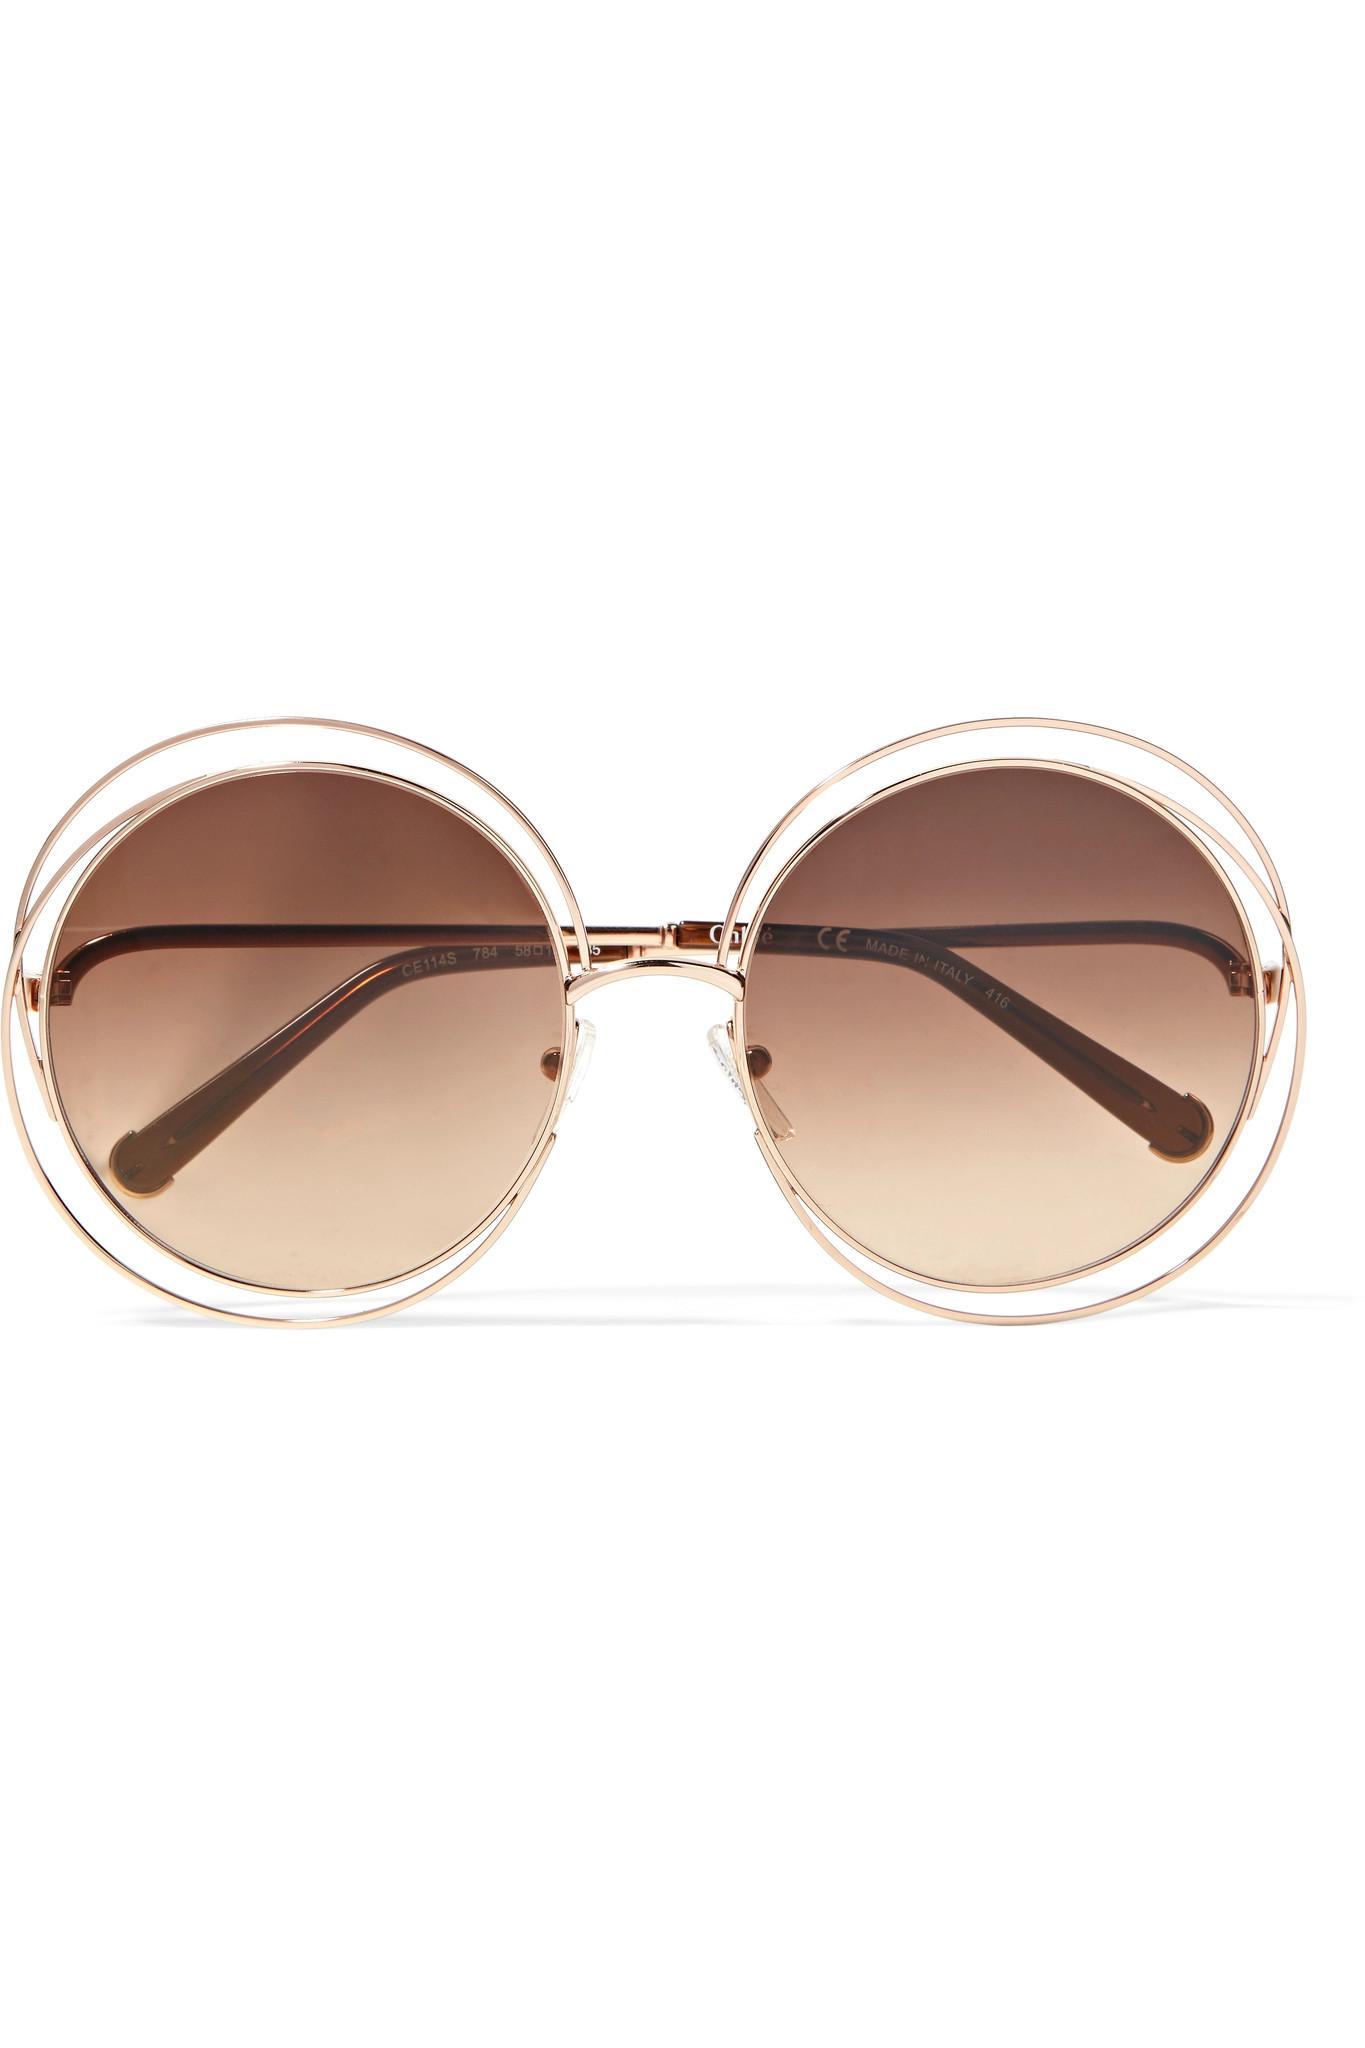 136b55ac79 Chloé Carlina Round-frame Rose Gold-tone Sunglasses Gold One Size in ...